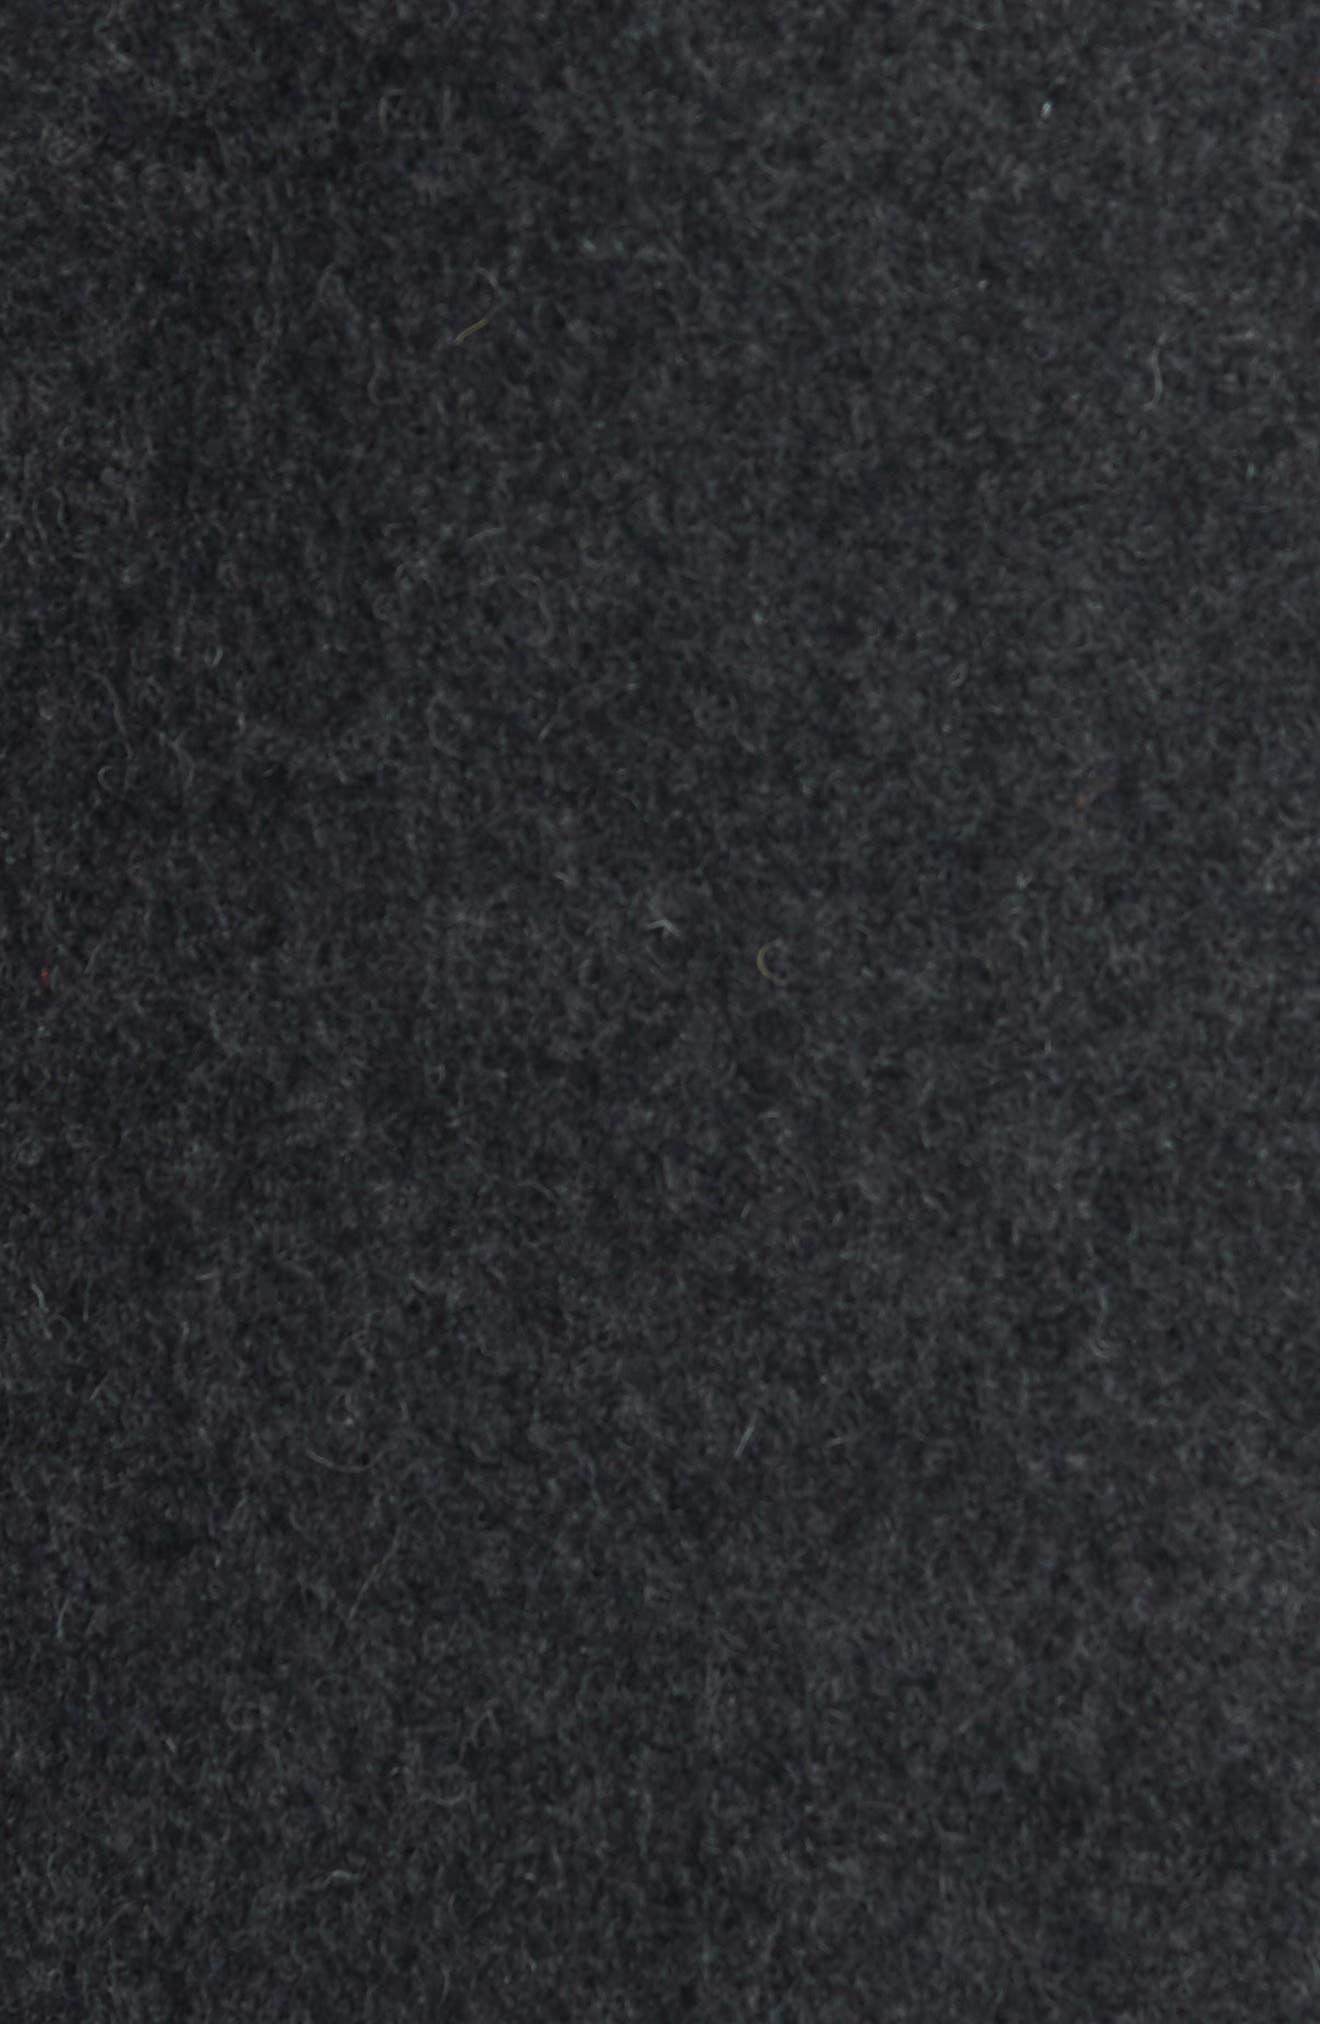 Slim Fit Melton Wool Blend Peacoat,                             Alternate thumbnail 6, color,                             022